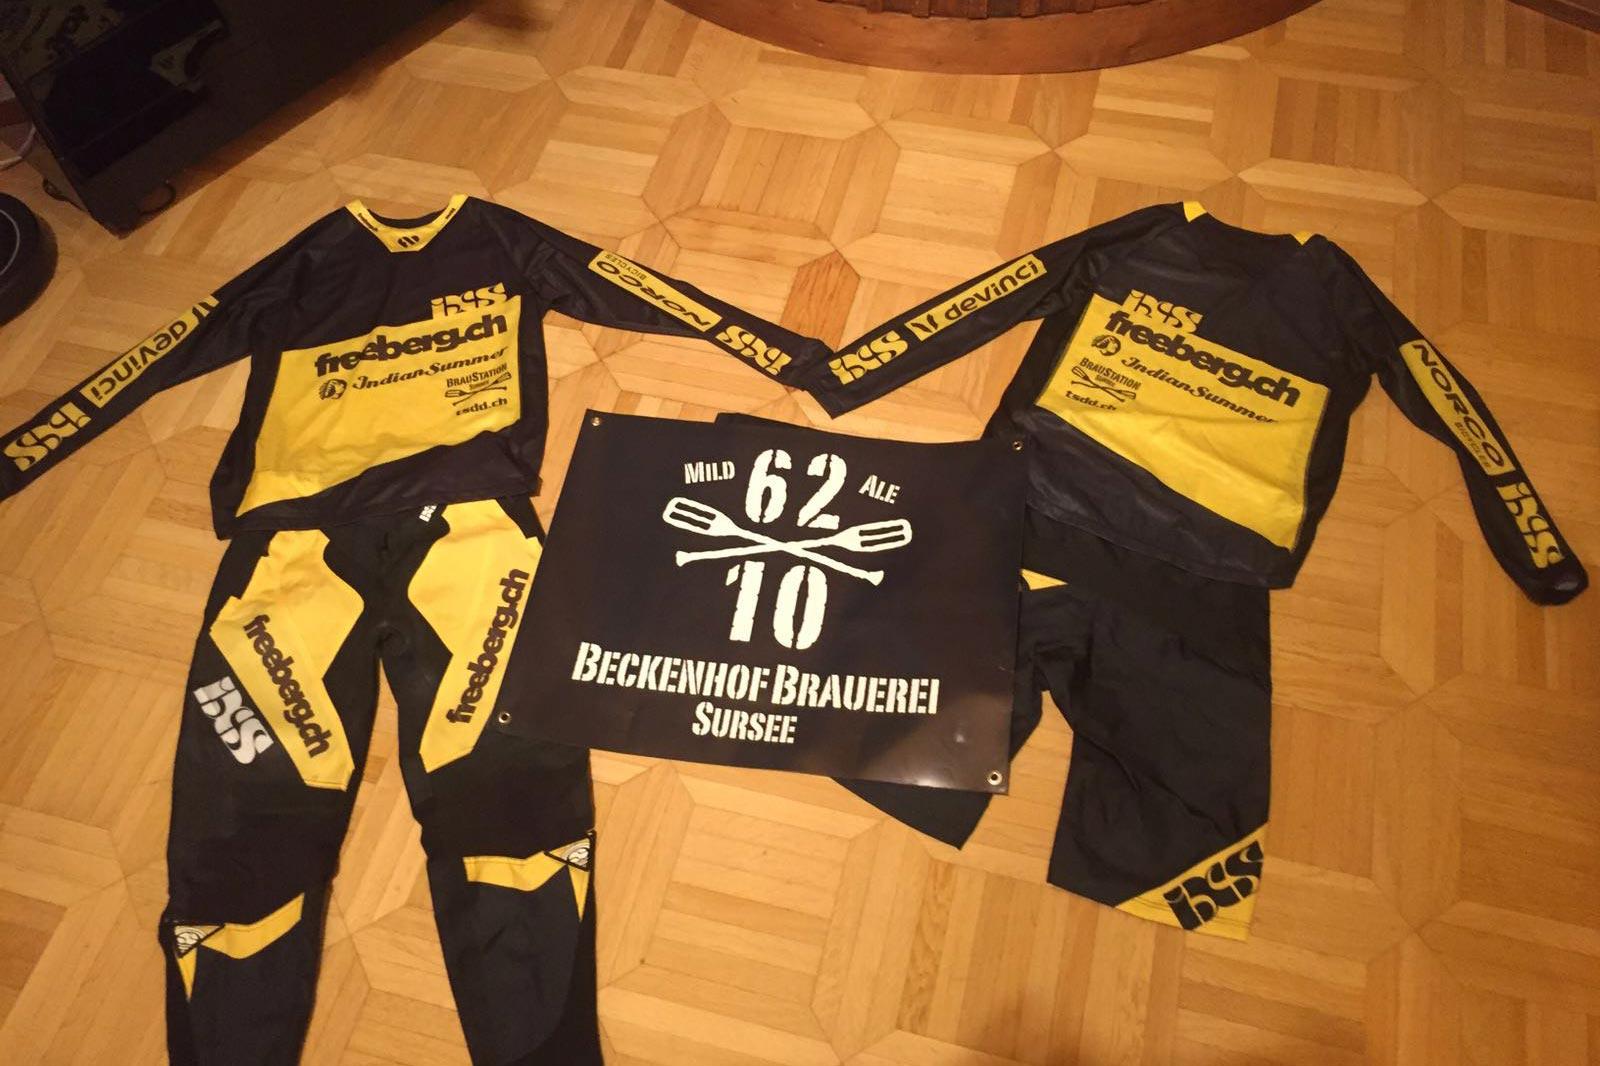 Race-Trikots für die Teamfahrer des Freeberg-Teams